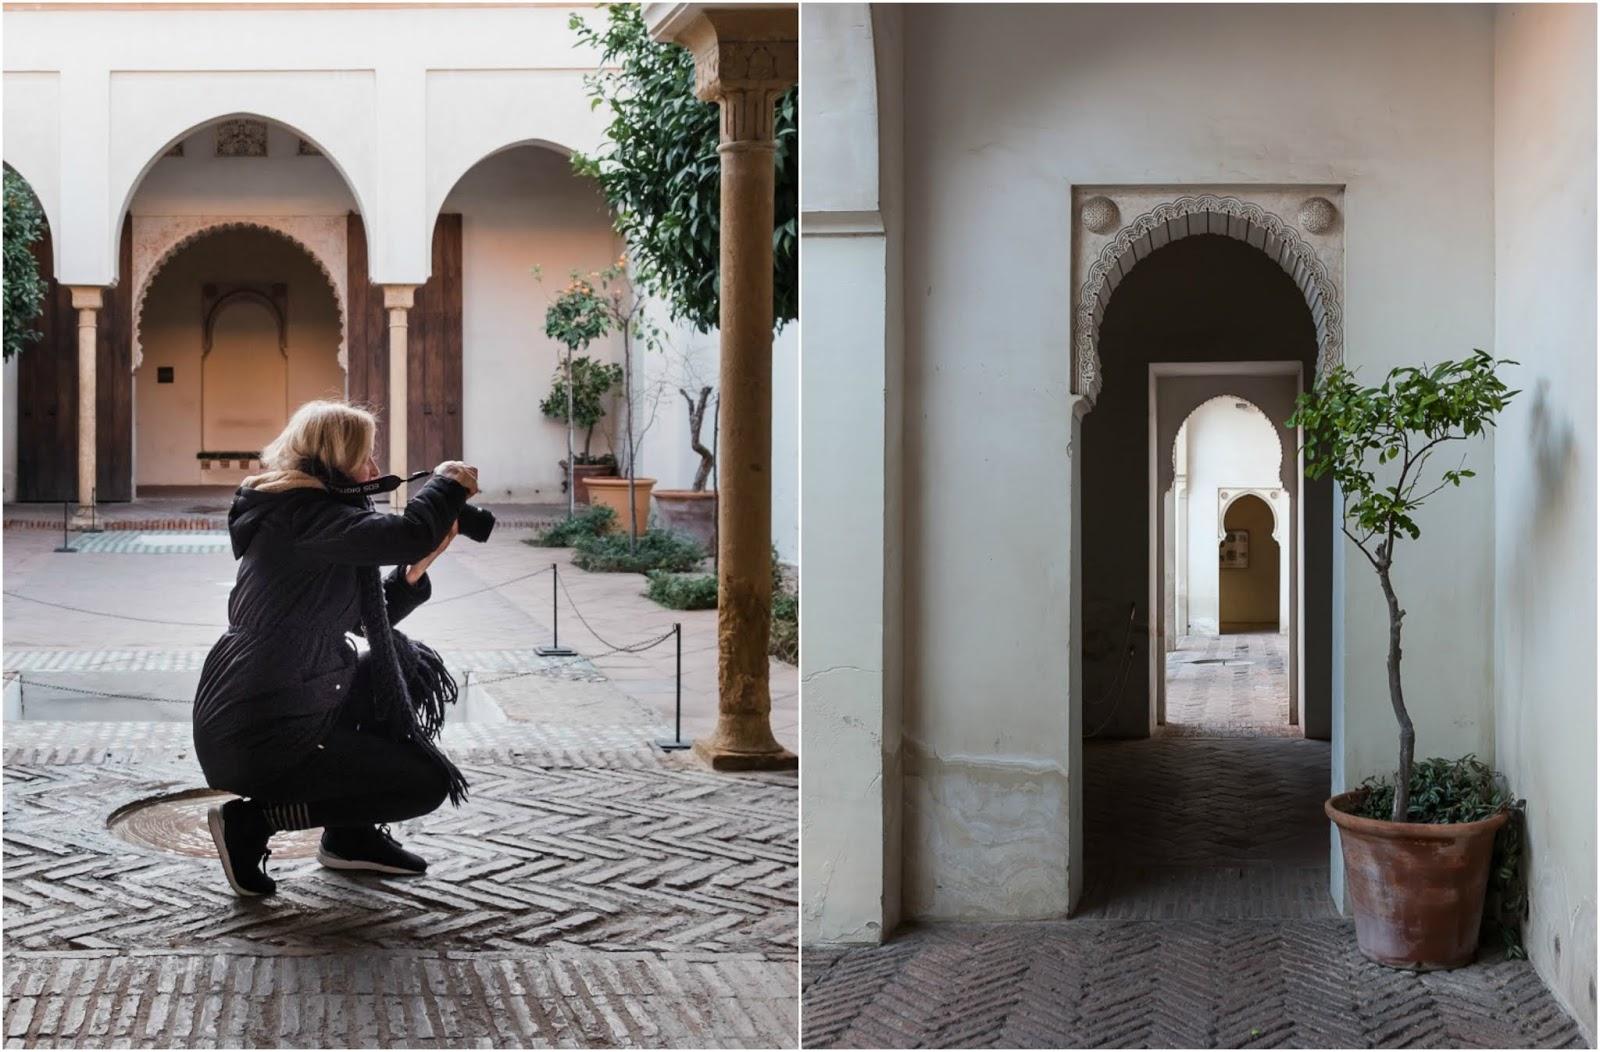 Malaga photo tour with Tiina Arminen